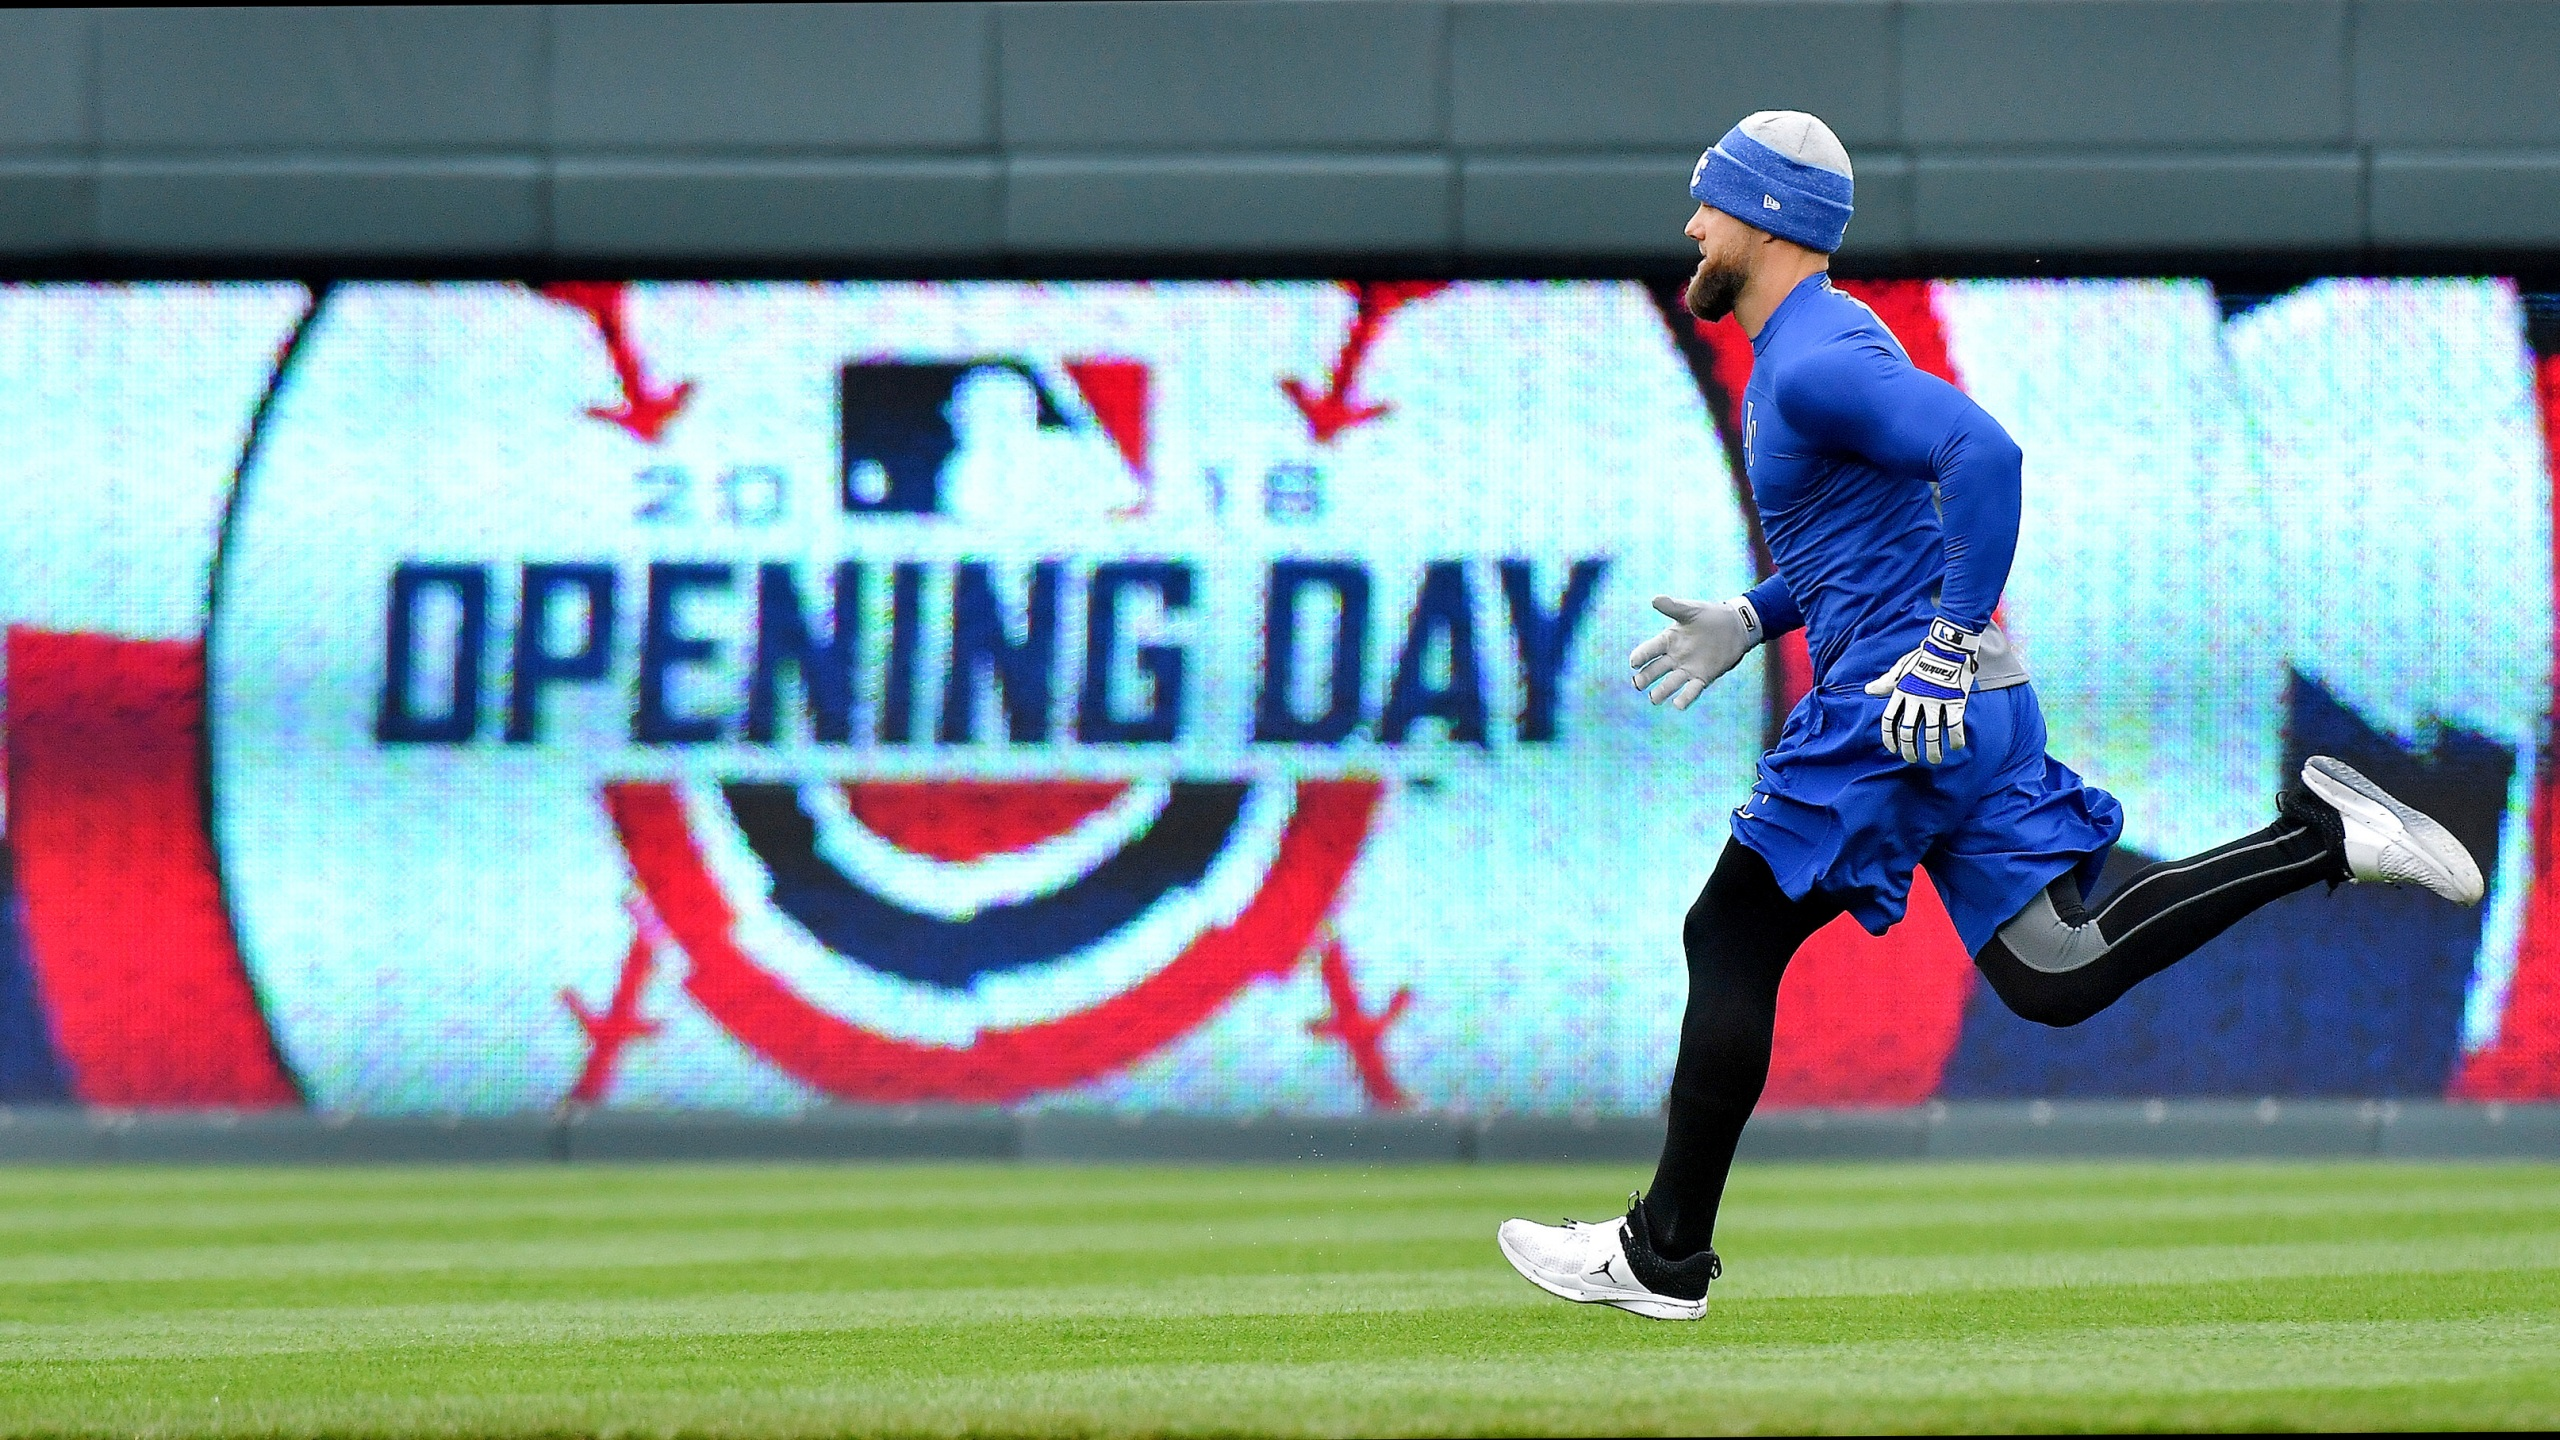 Royals_Opening_Day_Baseball_94595-159532.jpg36791678